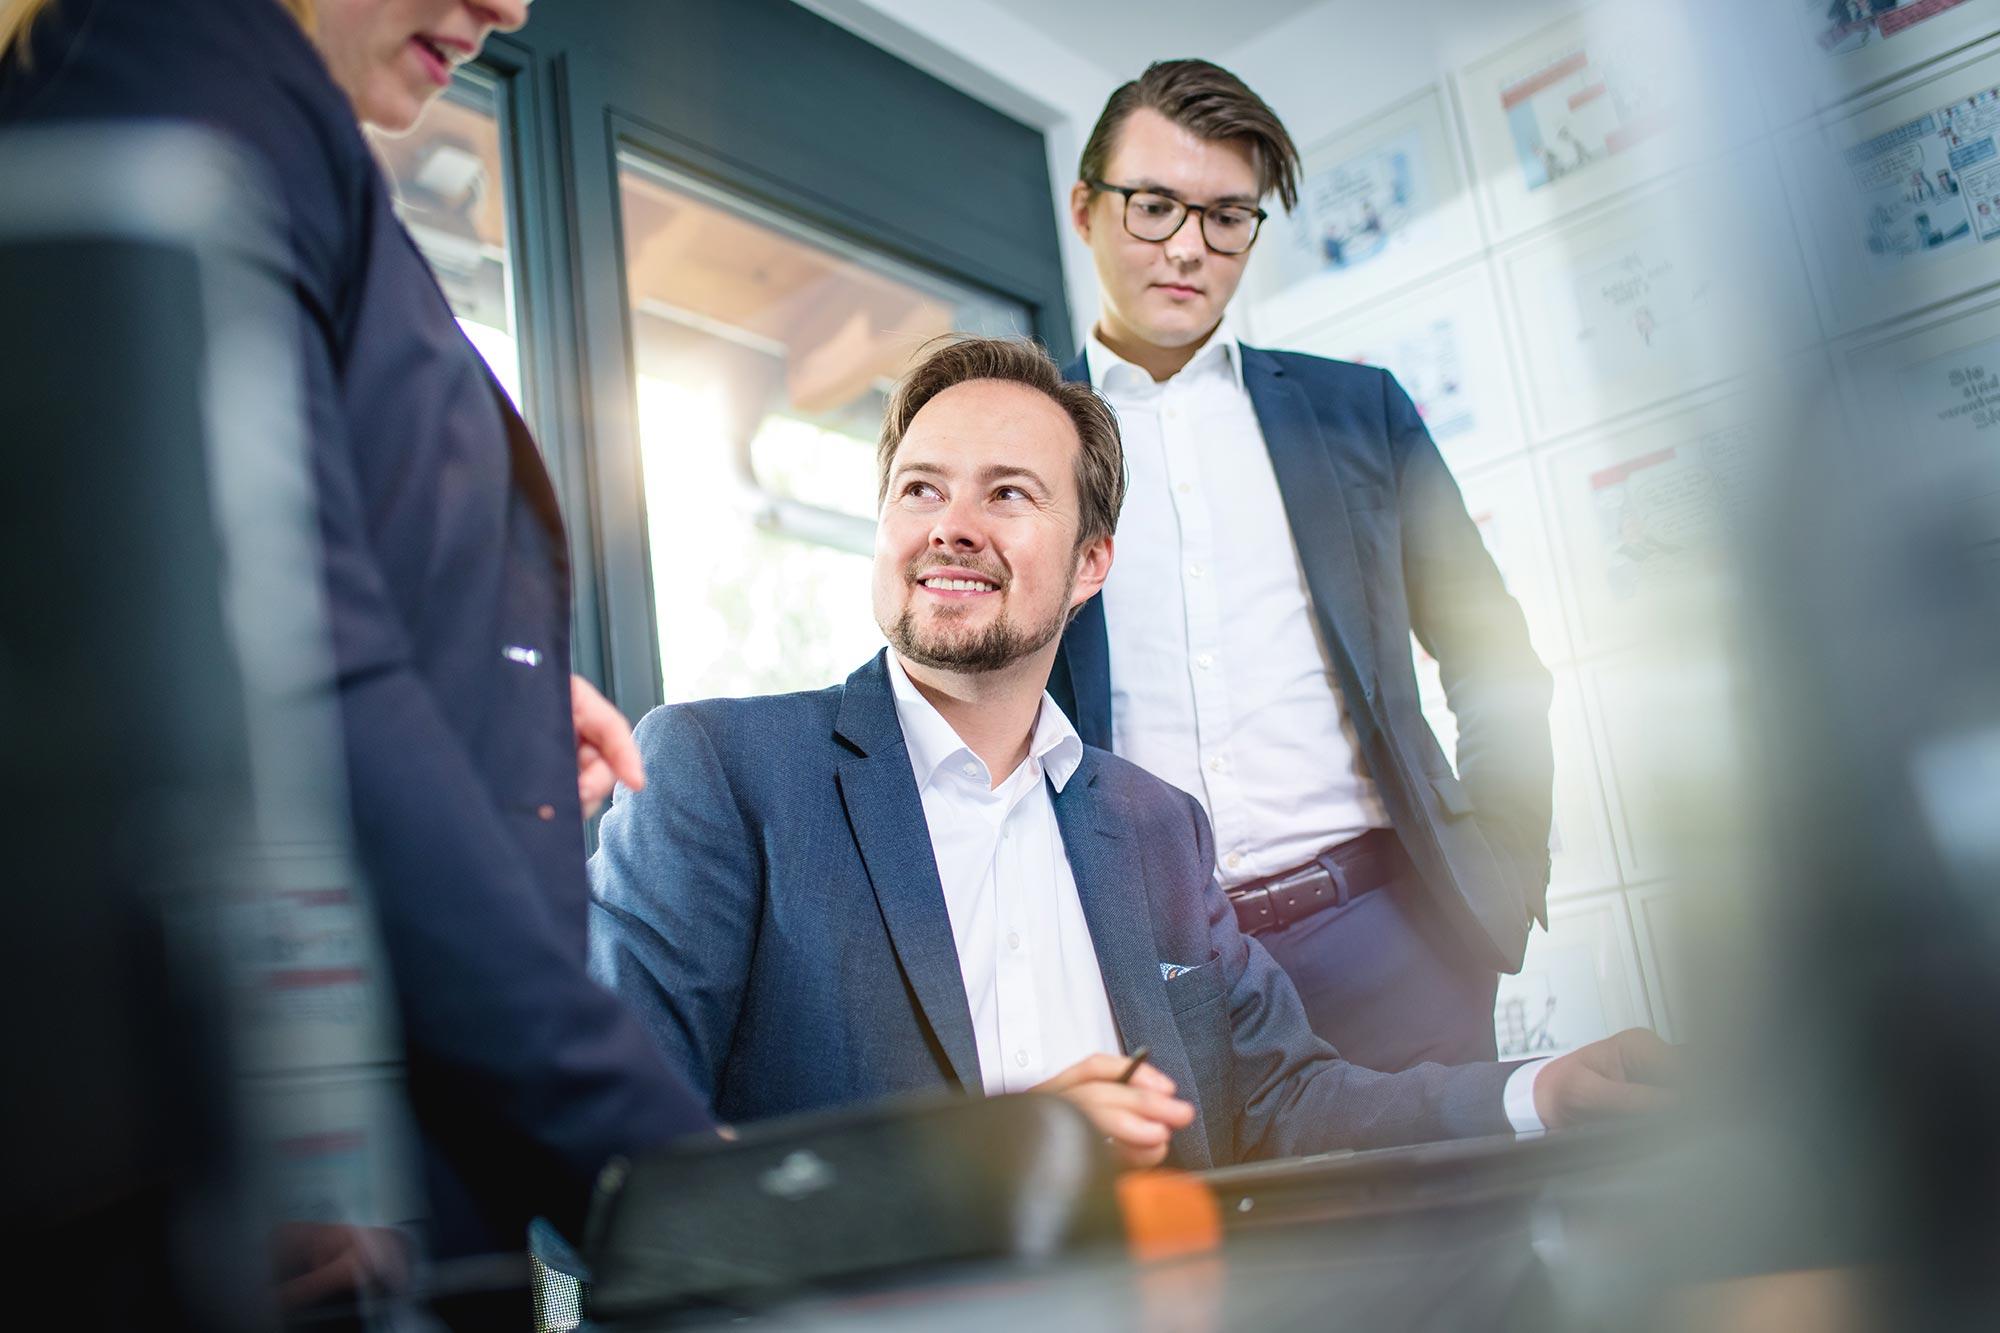 Santiago Advisors Beratungsagentur Imagemotive Businessfotografie Besprechung am Arbitsplatz Men in Suits